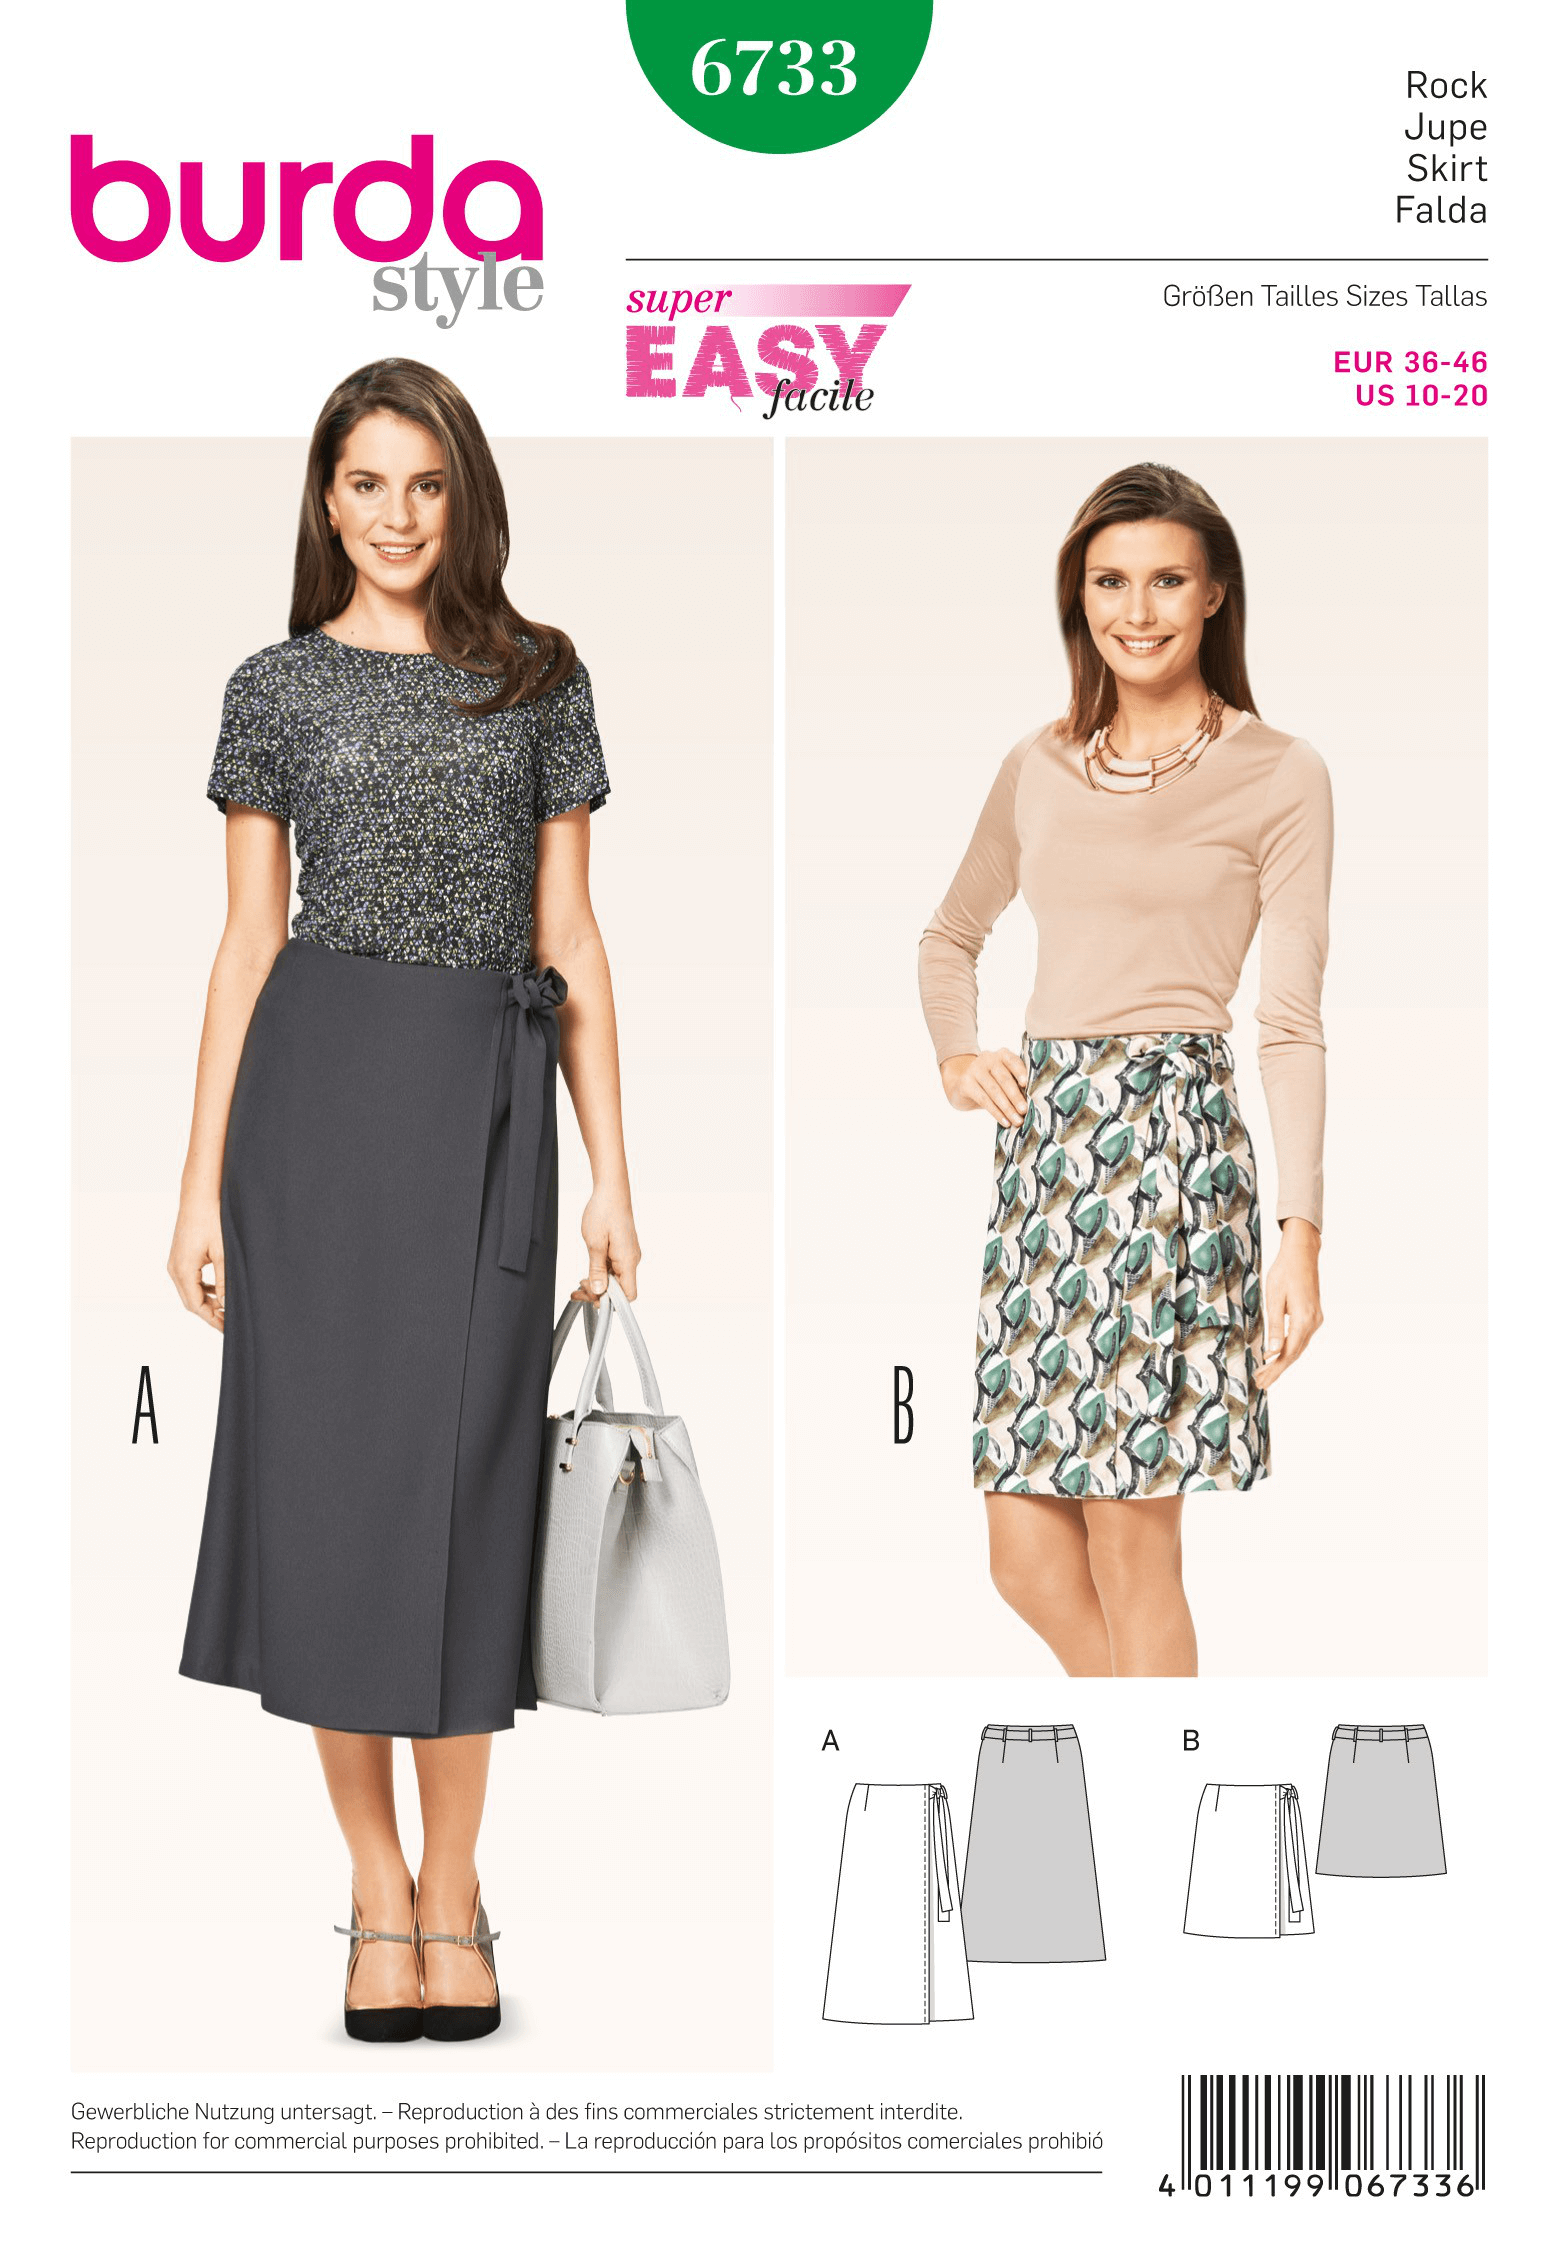 Burda Misses Wrap Skirt Easy Narrow Long Short Womans Fabric Sewing Pattern 6733